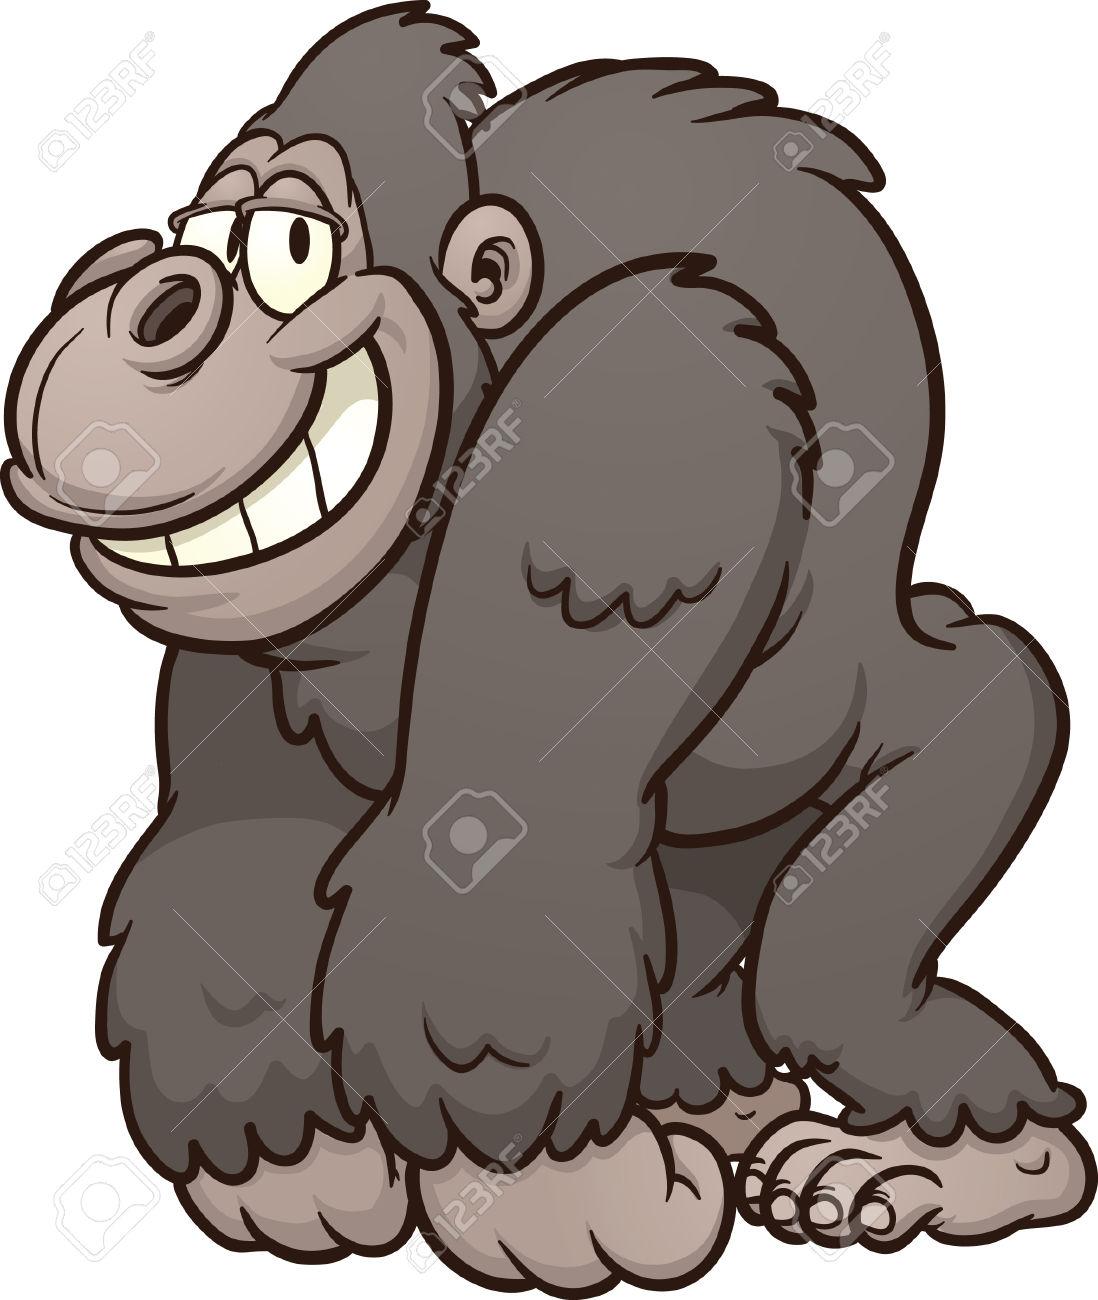 Gorilla Clipart #17735